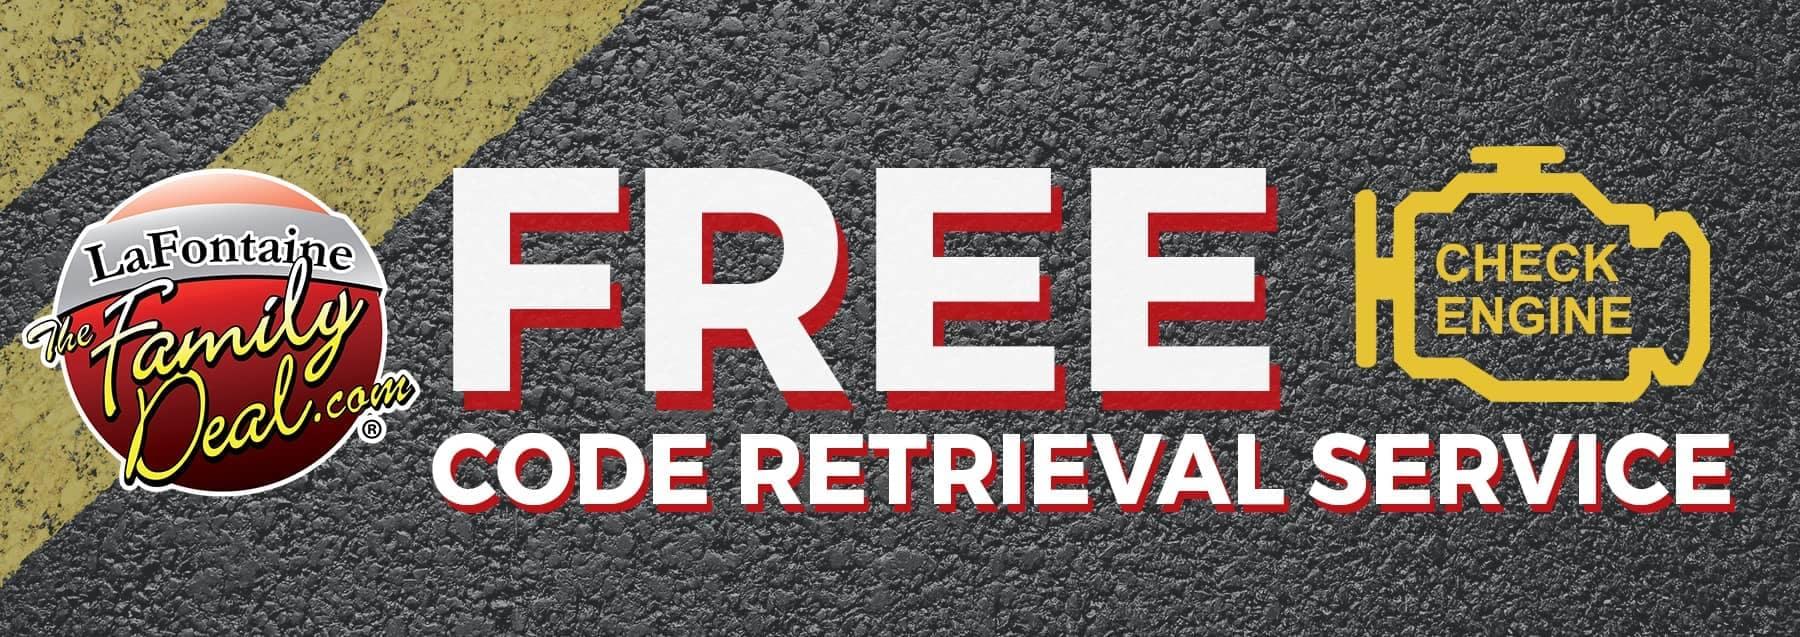 Free Code Retrieval Service